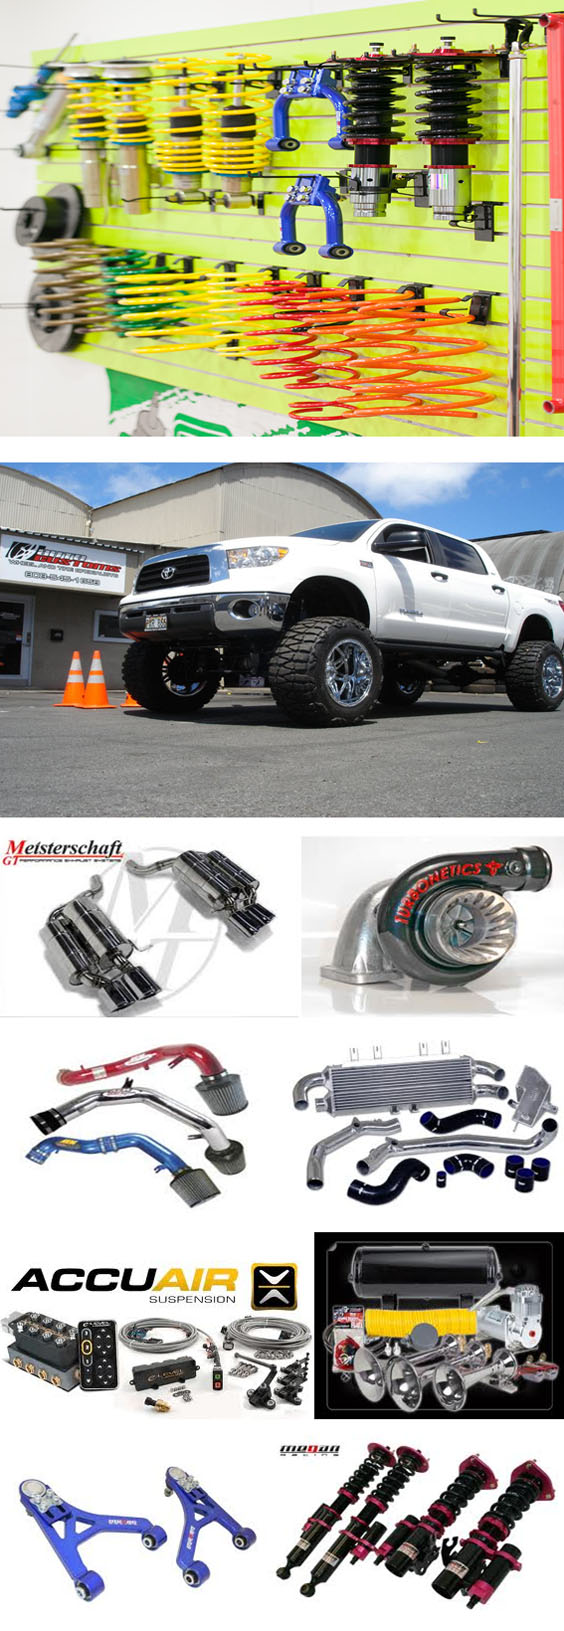 Performance Auto Parts Honolulu Automotive Parts And Accessories